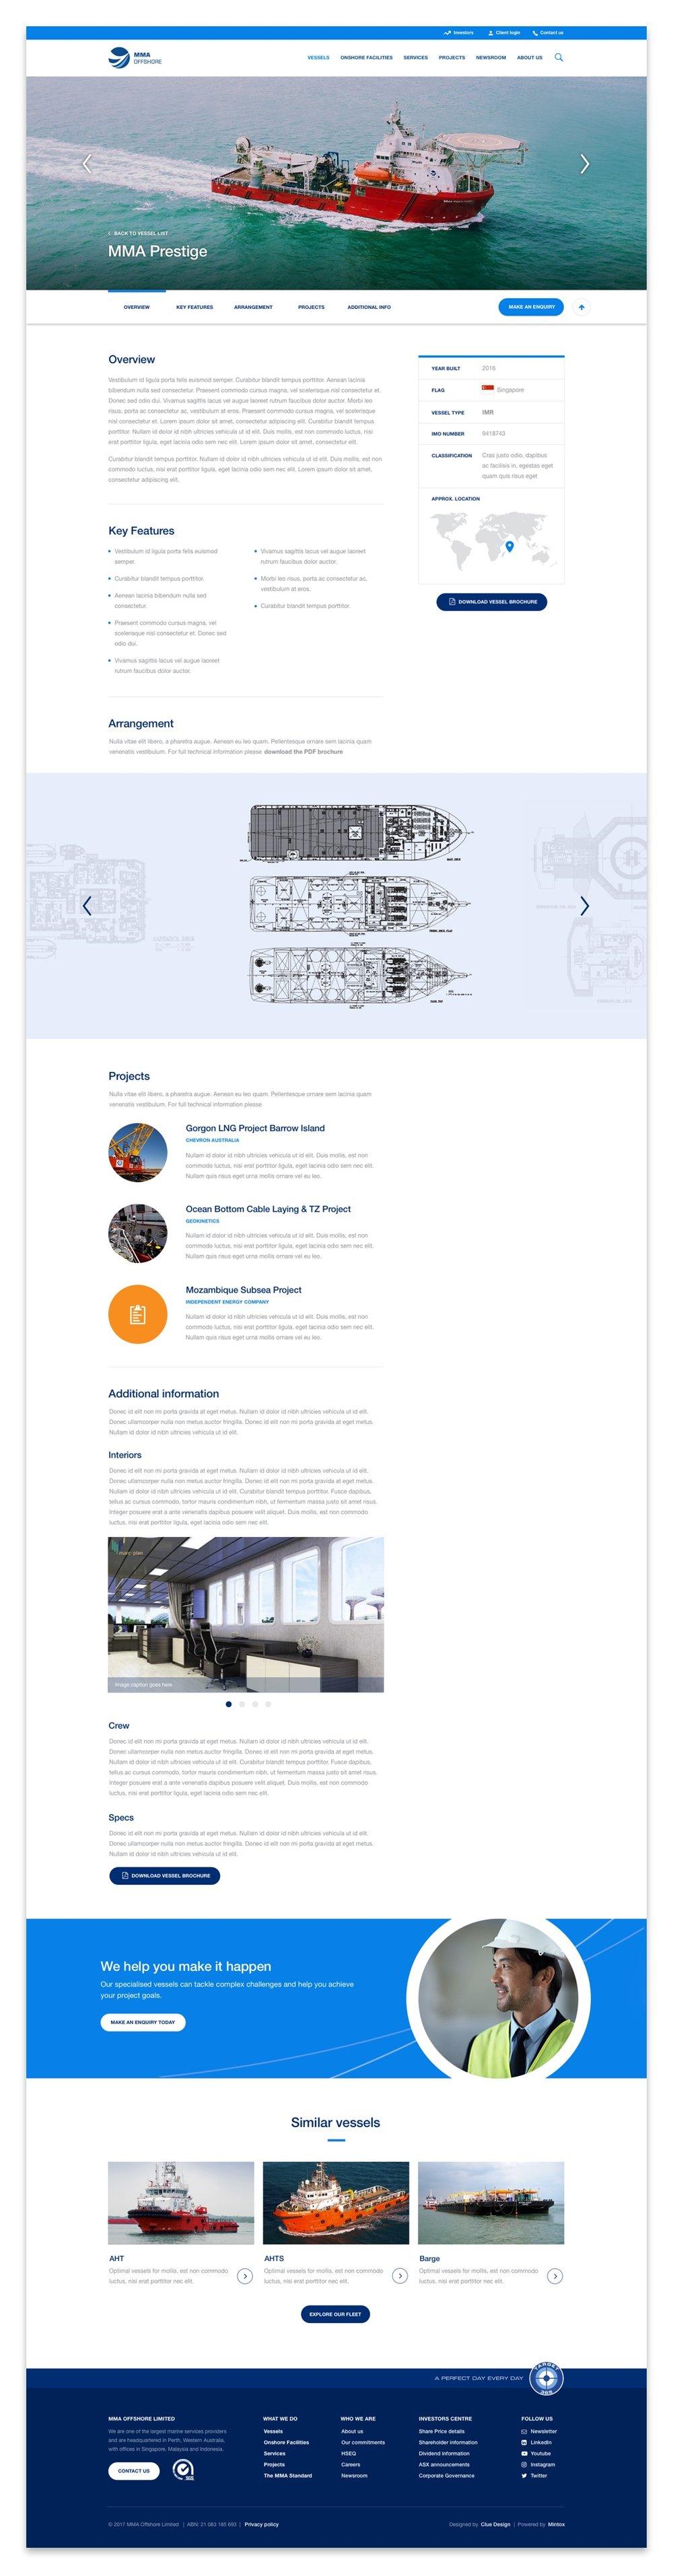 MMA Offshore marine vessels web UI UX design